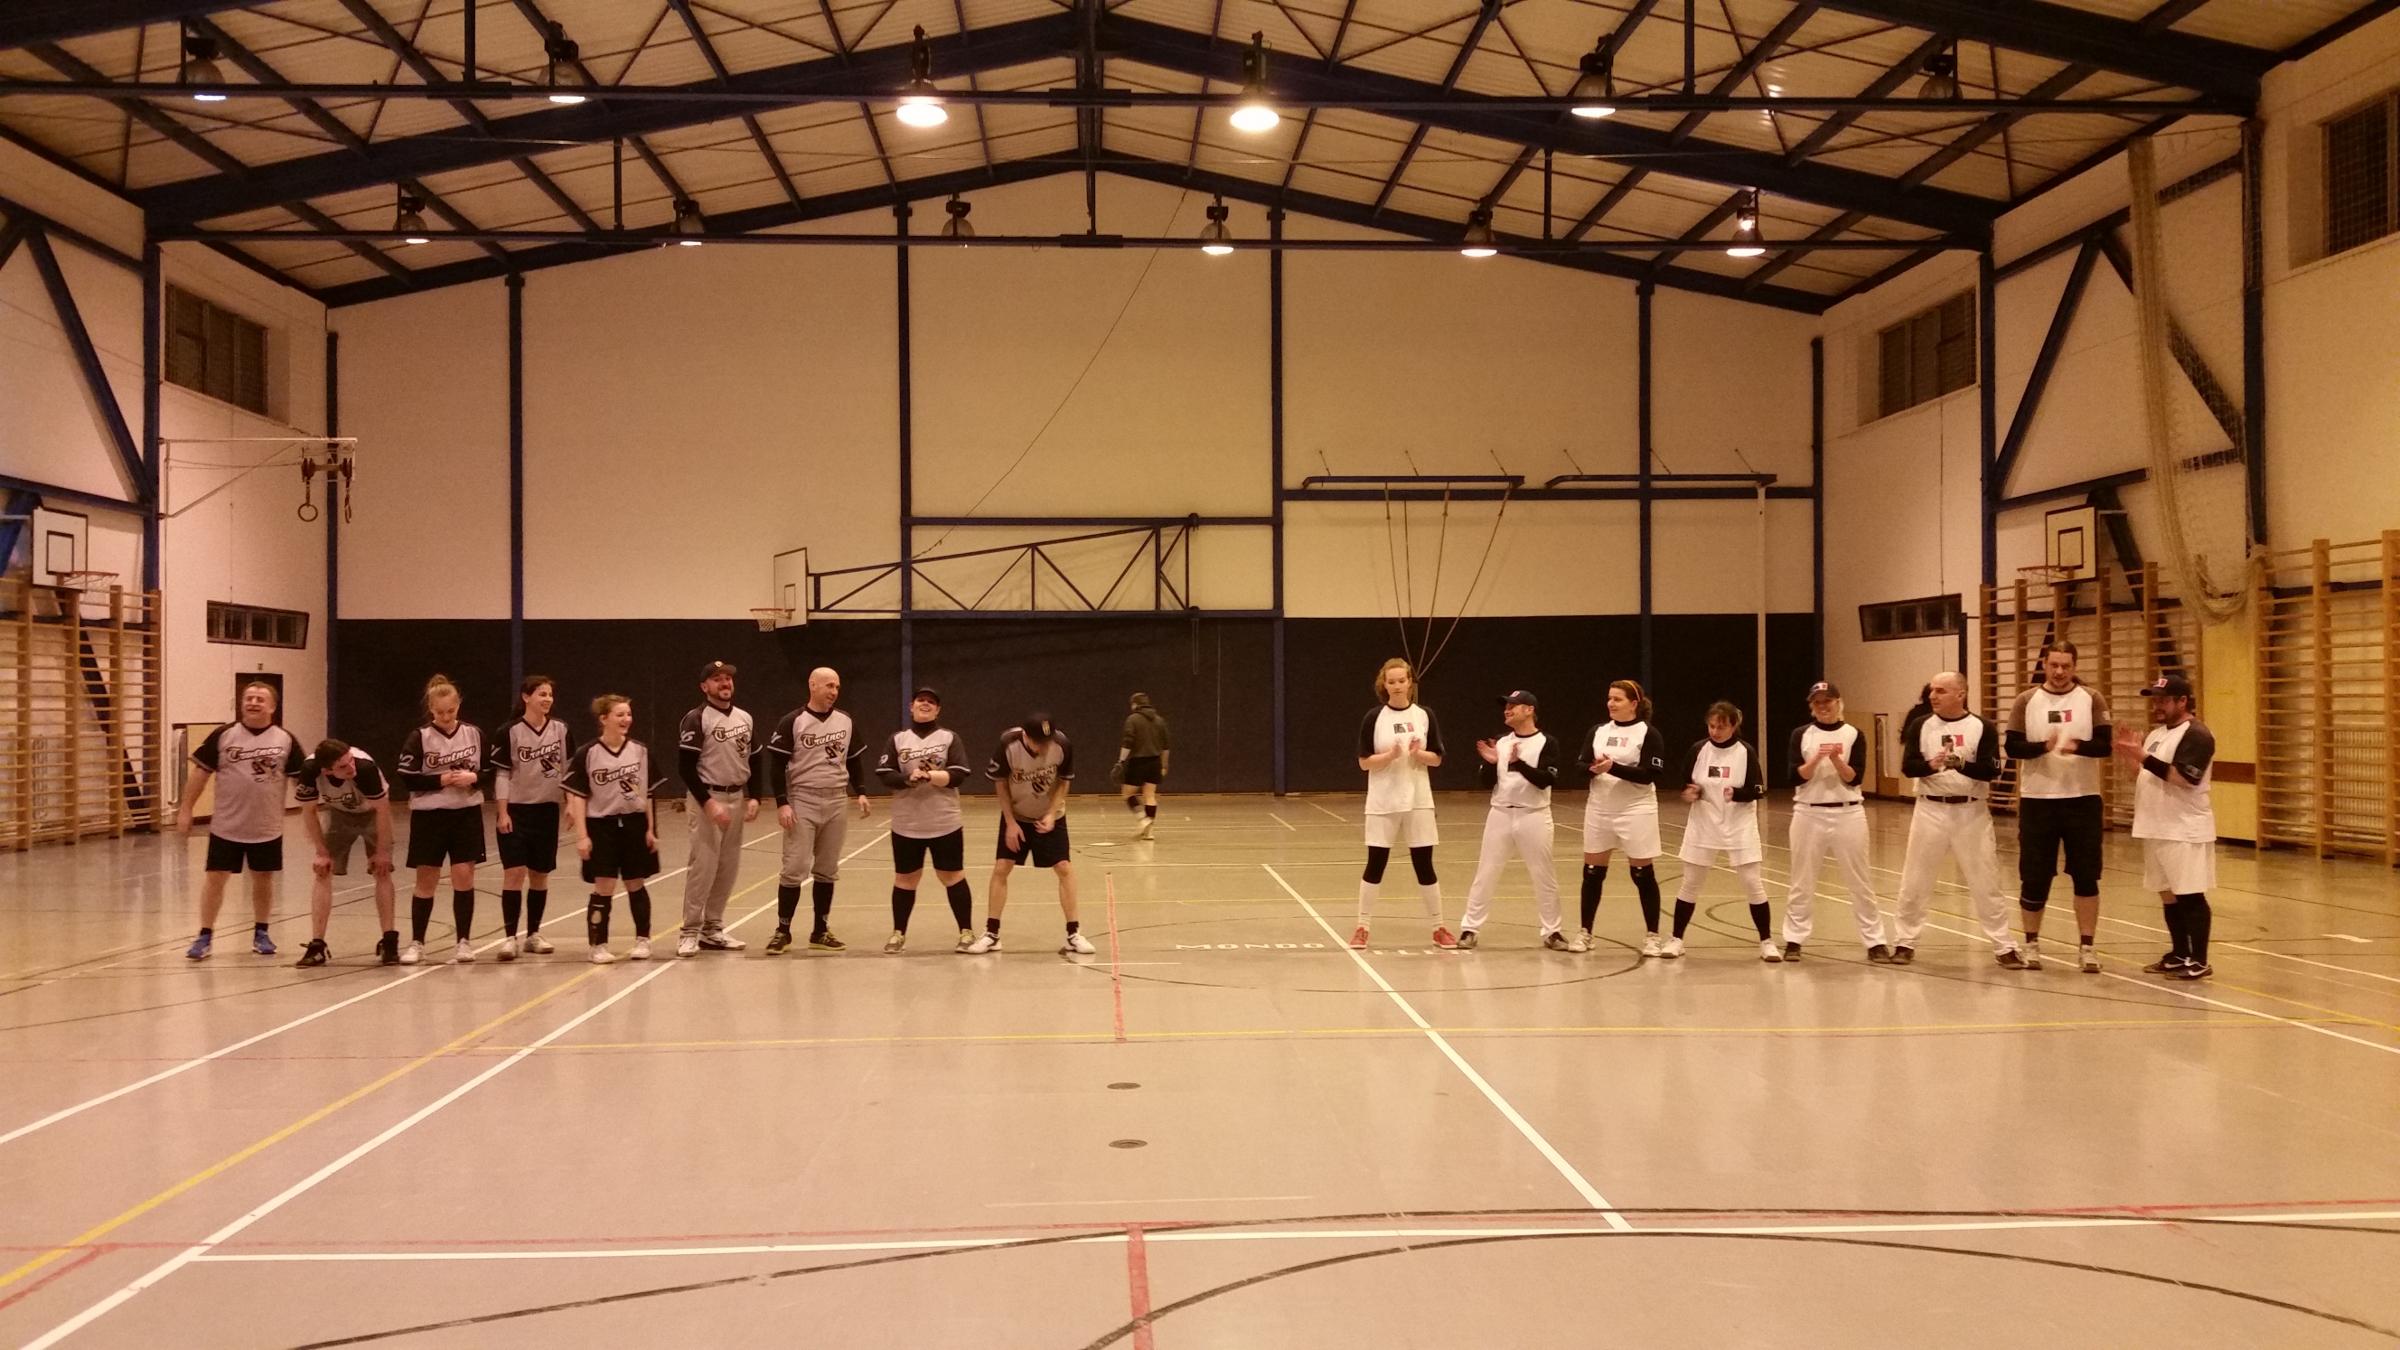 Indoor Trautenau 2016 | Rytíři - Waynes 1 | foto Meggy